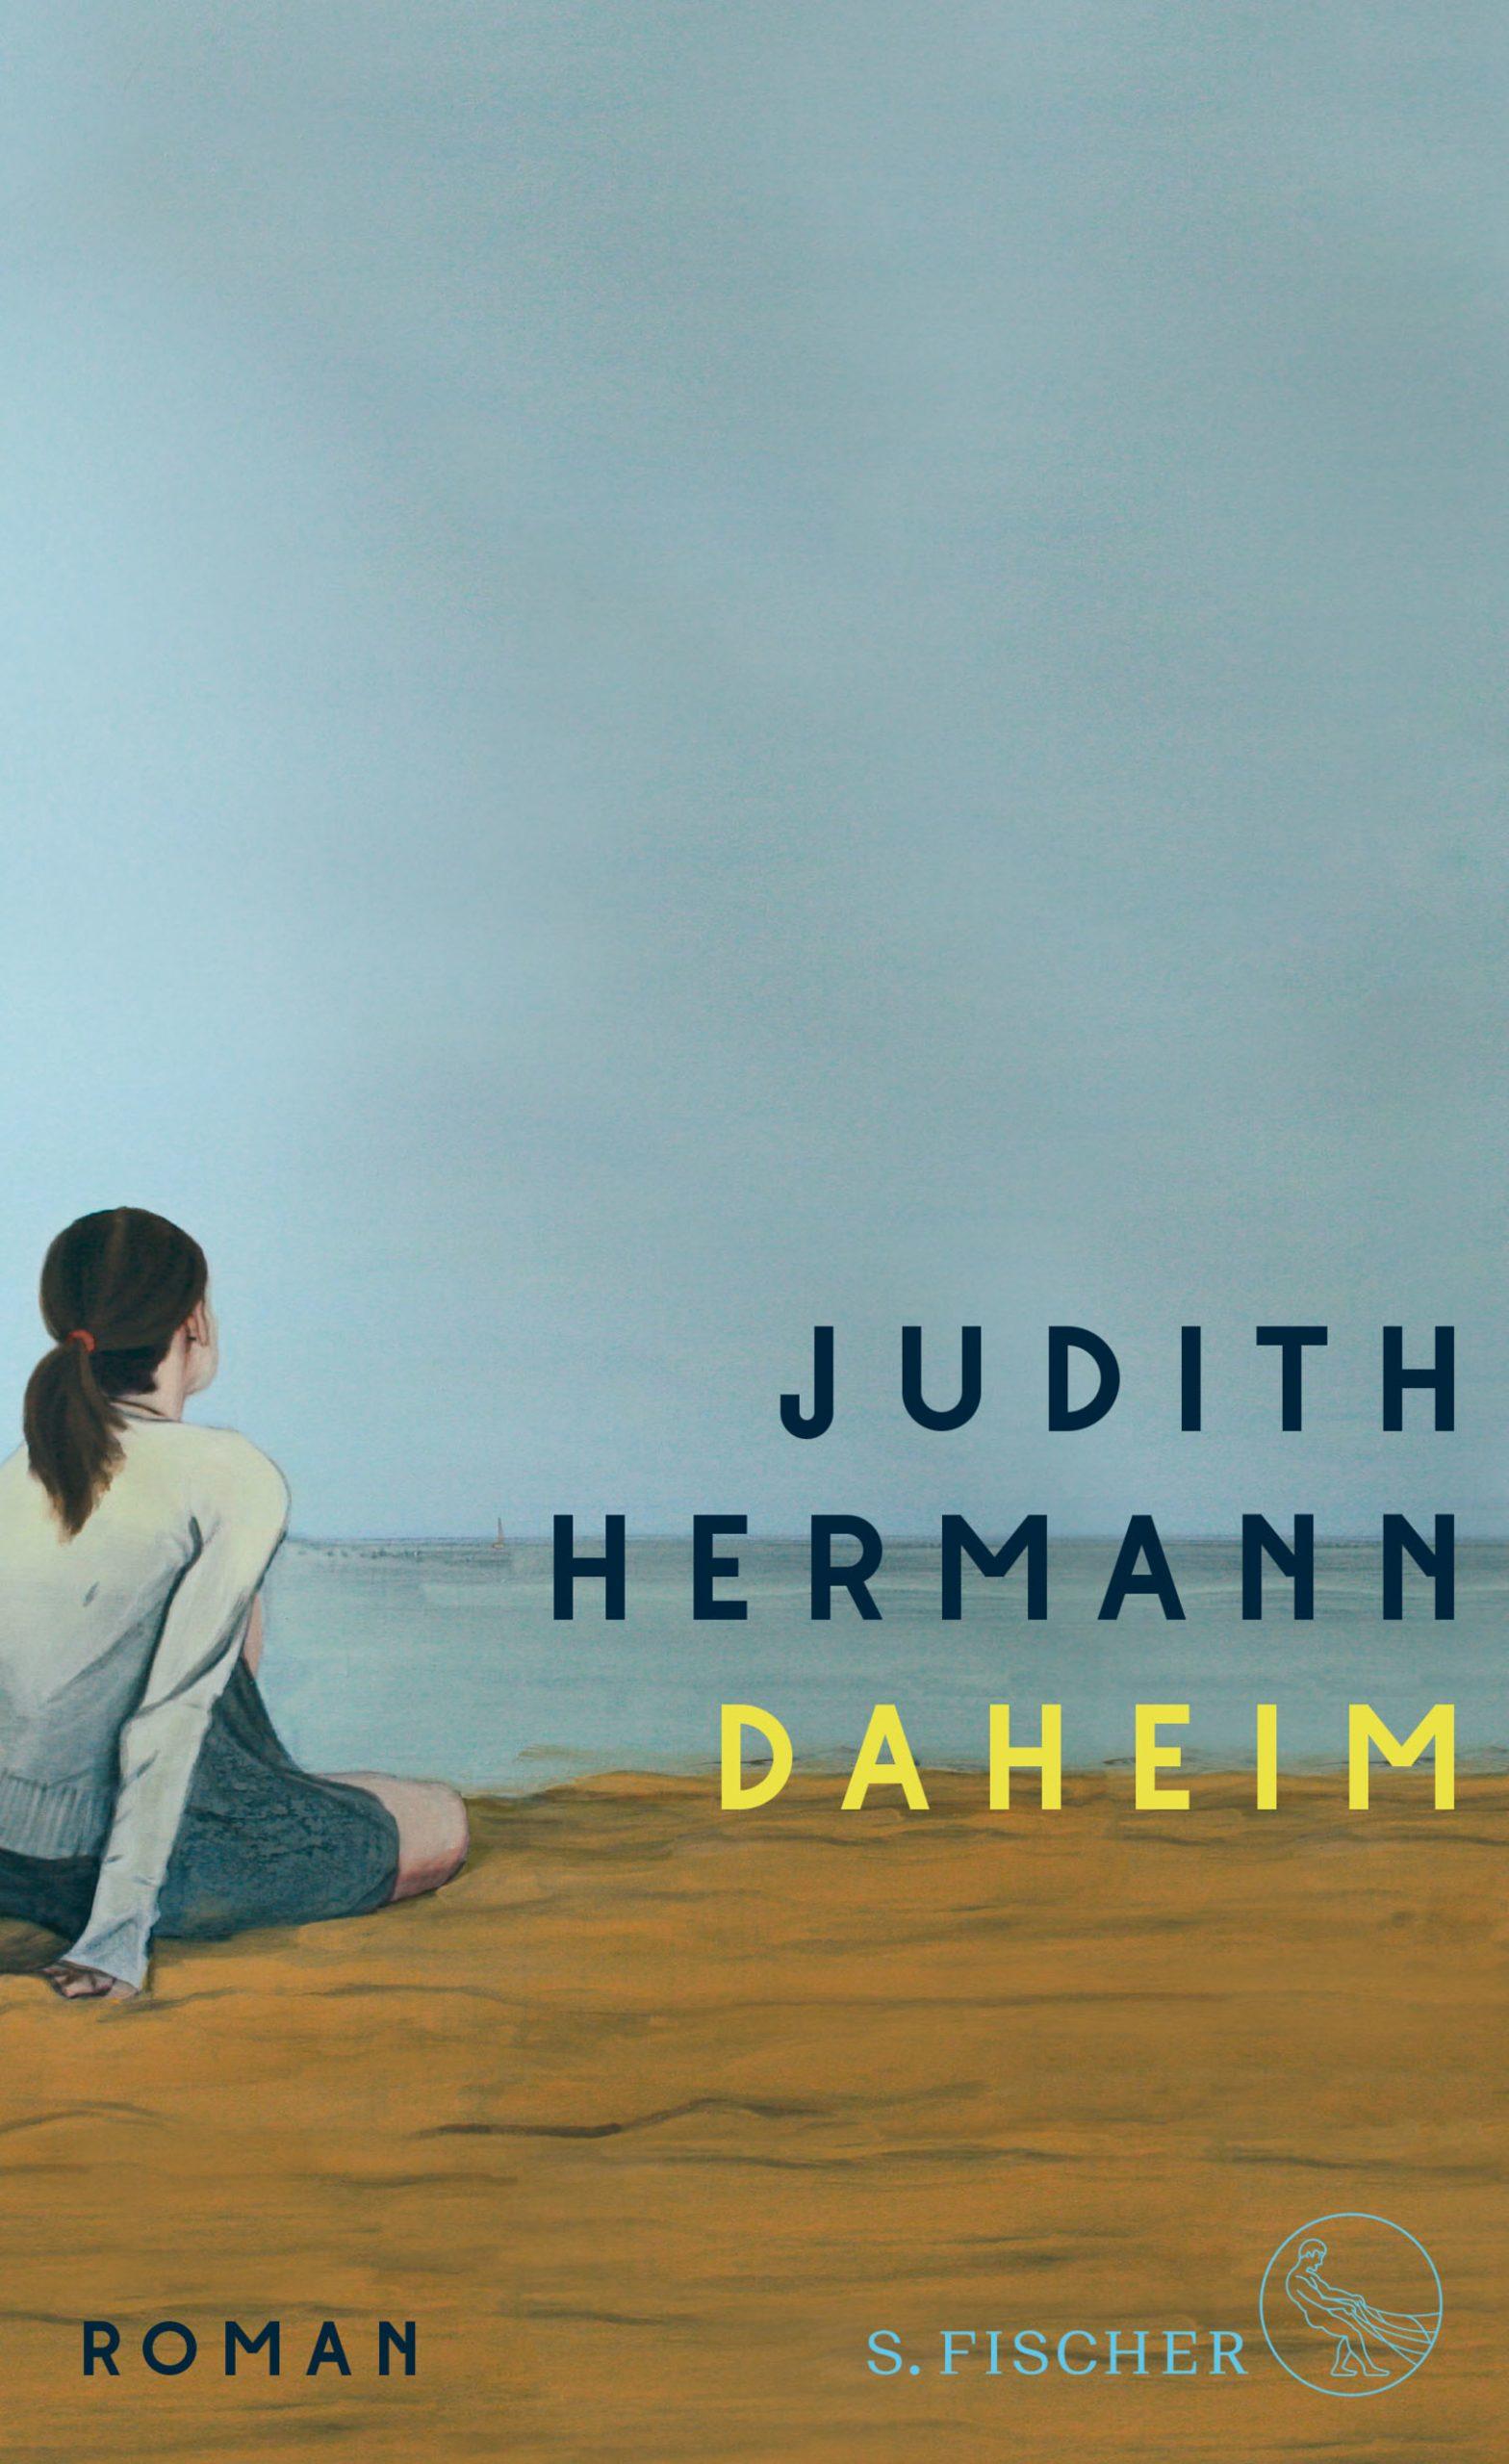 U1-978-3-10-397035-7_Hermann_Daheim_dlg.indd